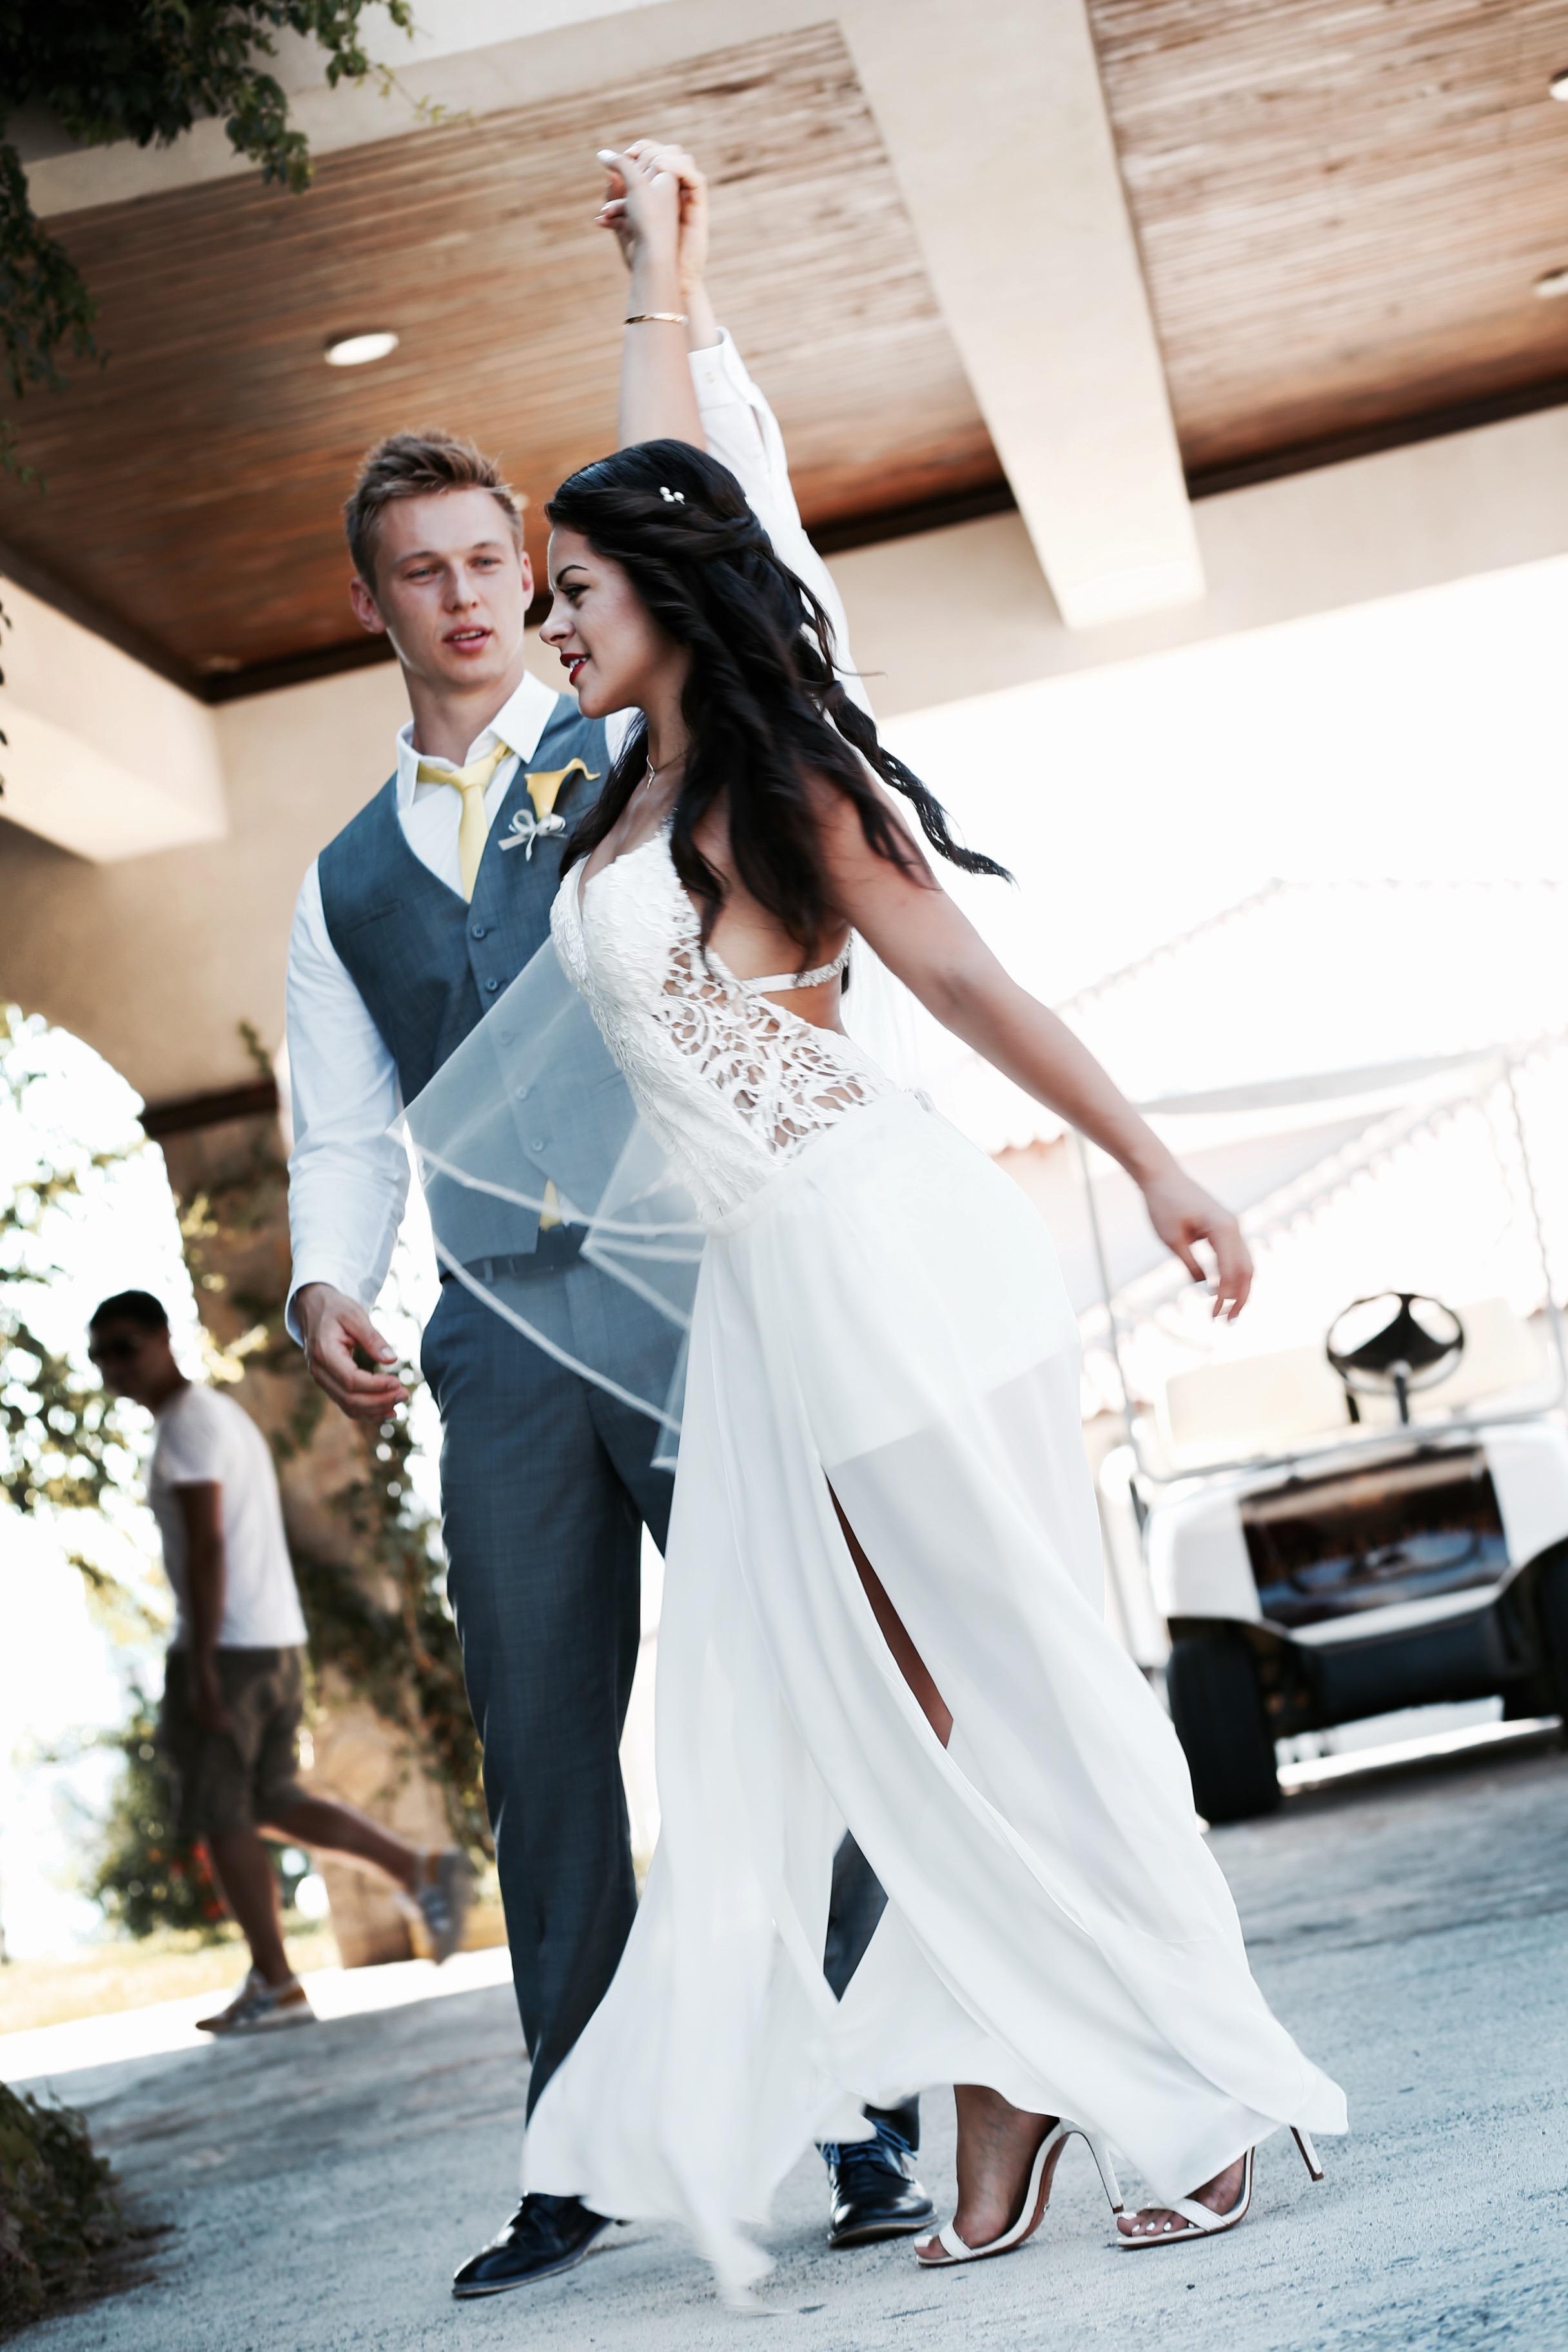 Nathalie Kraynina Bride Iva & Dennis Wedding  gb50.jpg